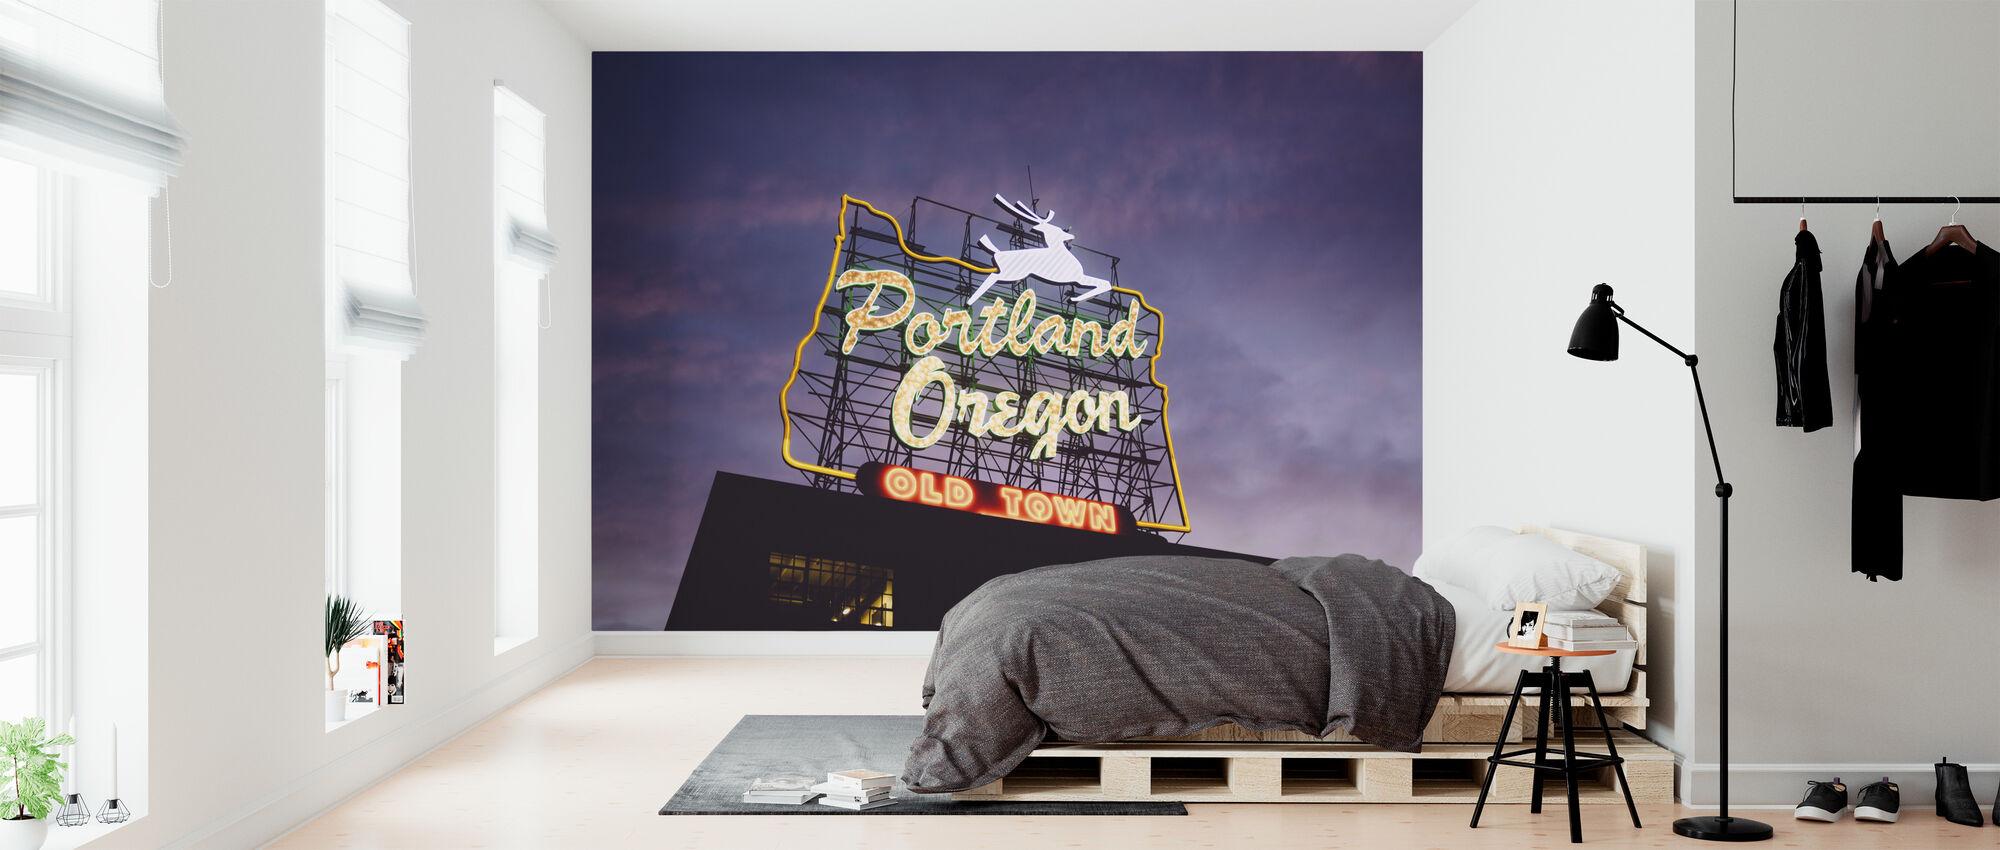 Portland Oregon Neon Sign - Wallpaper - Bedroom